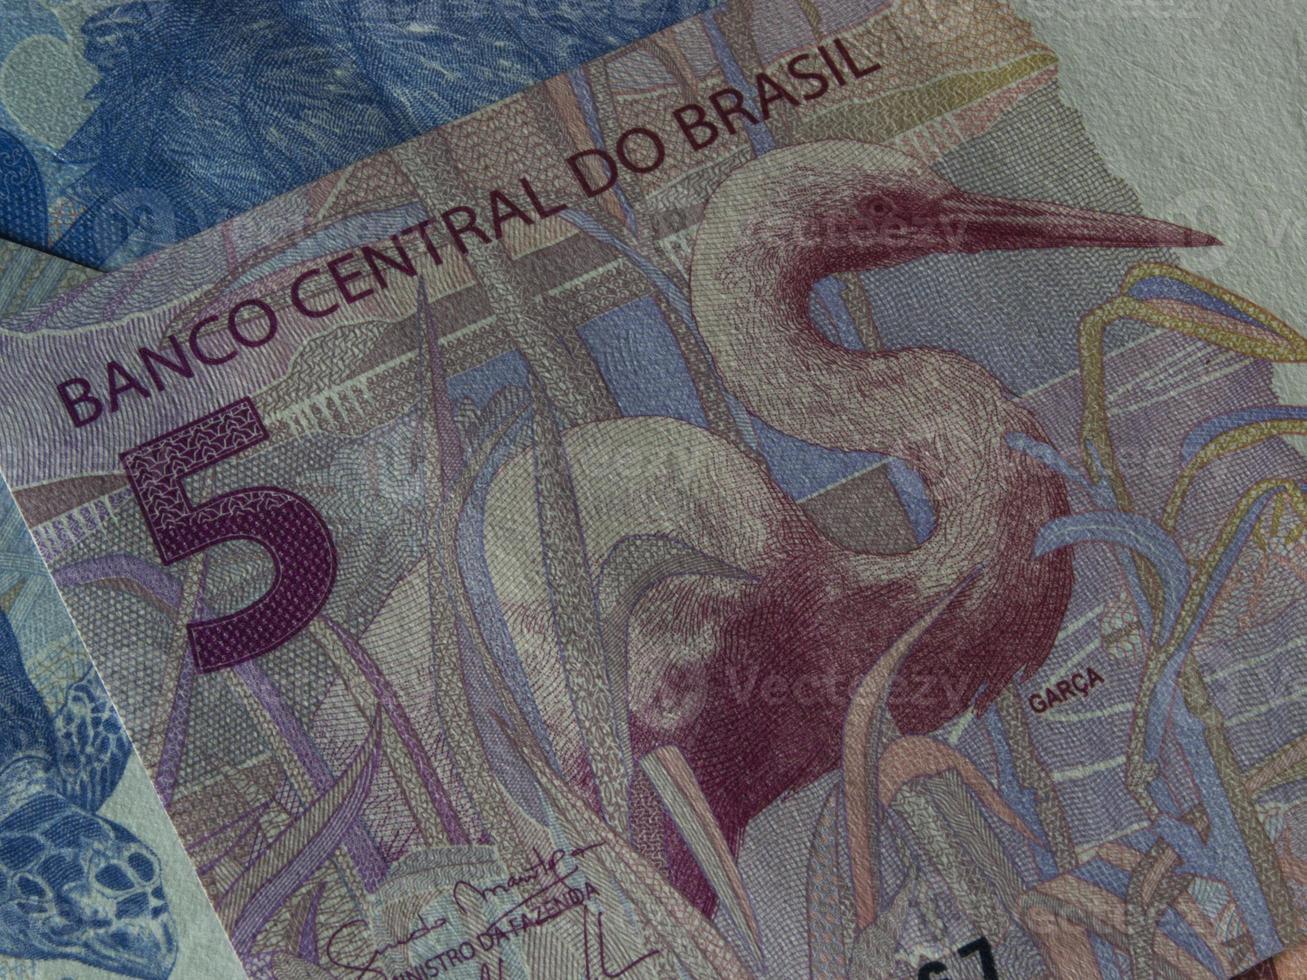 moeda brasileira close-up foto